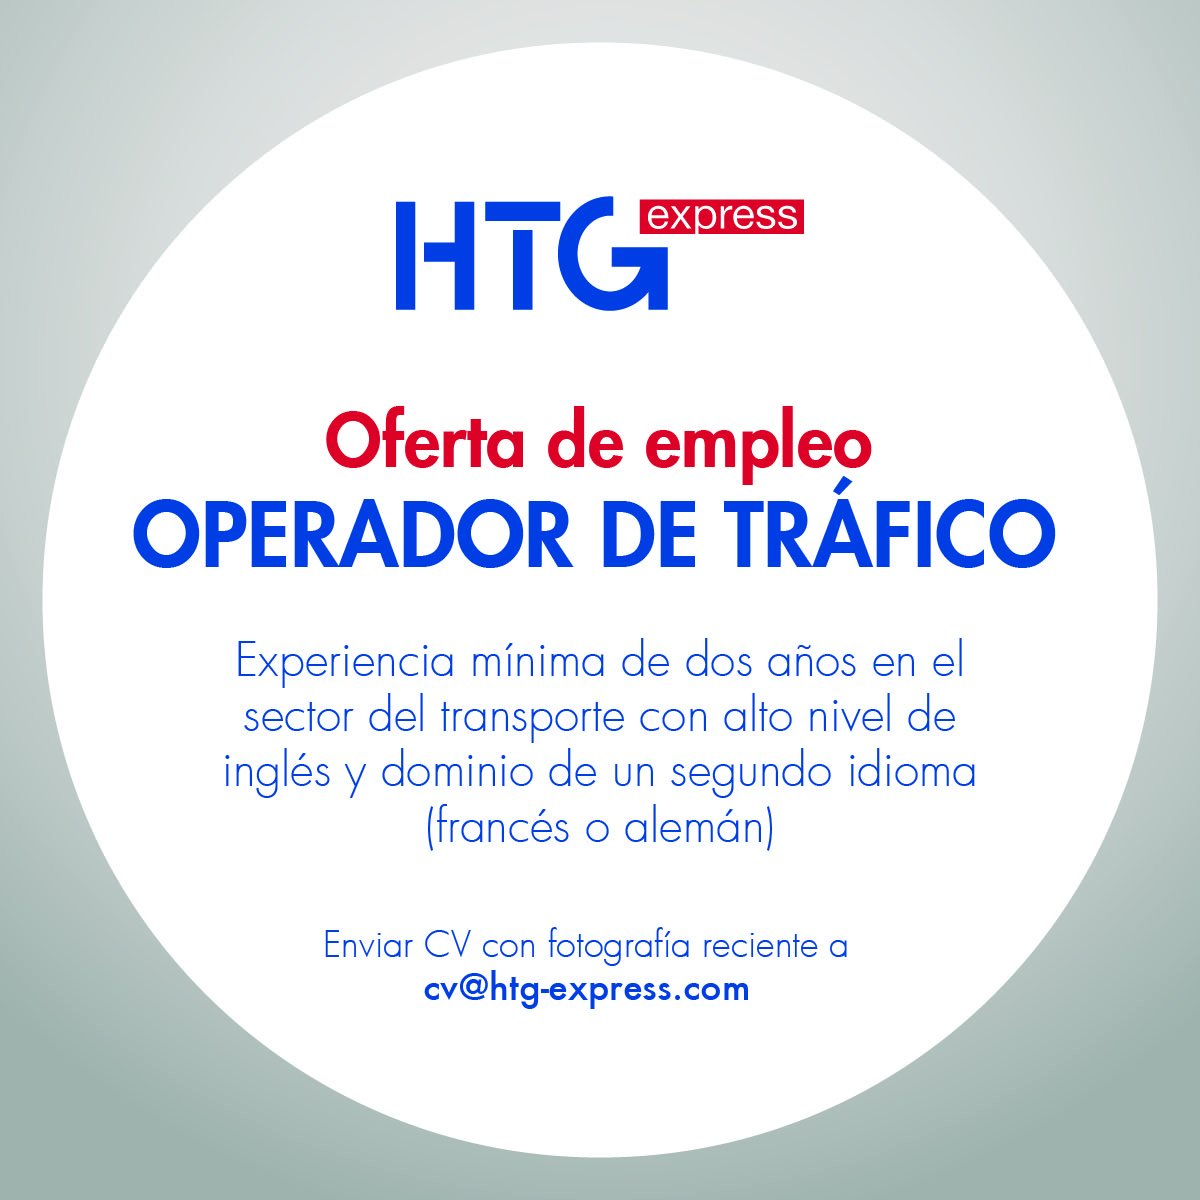 Htg Express On Twitter Oferta De Empleo De Operador De Tráfico